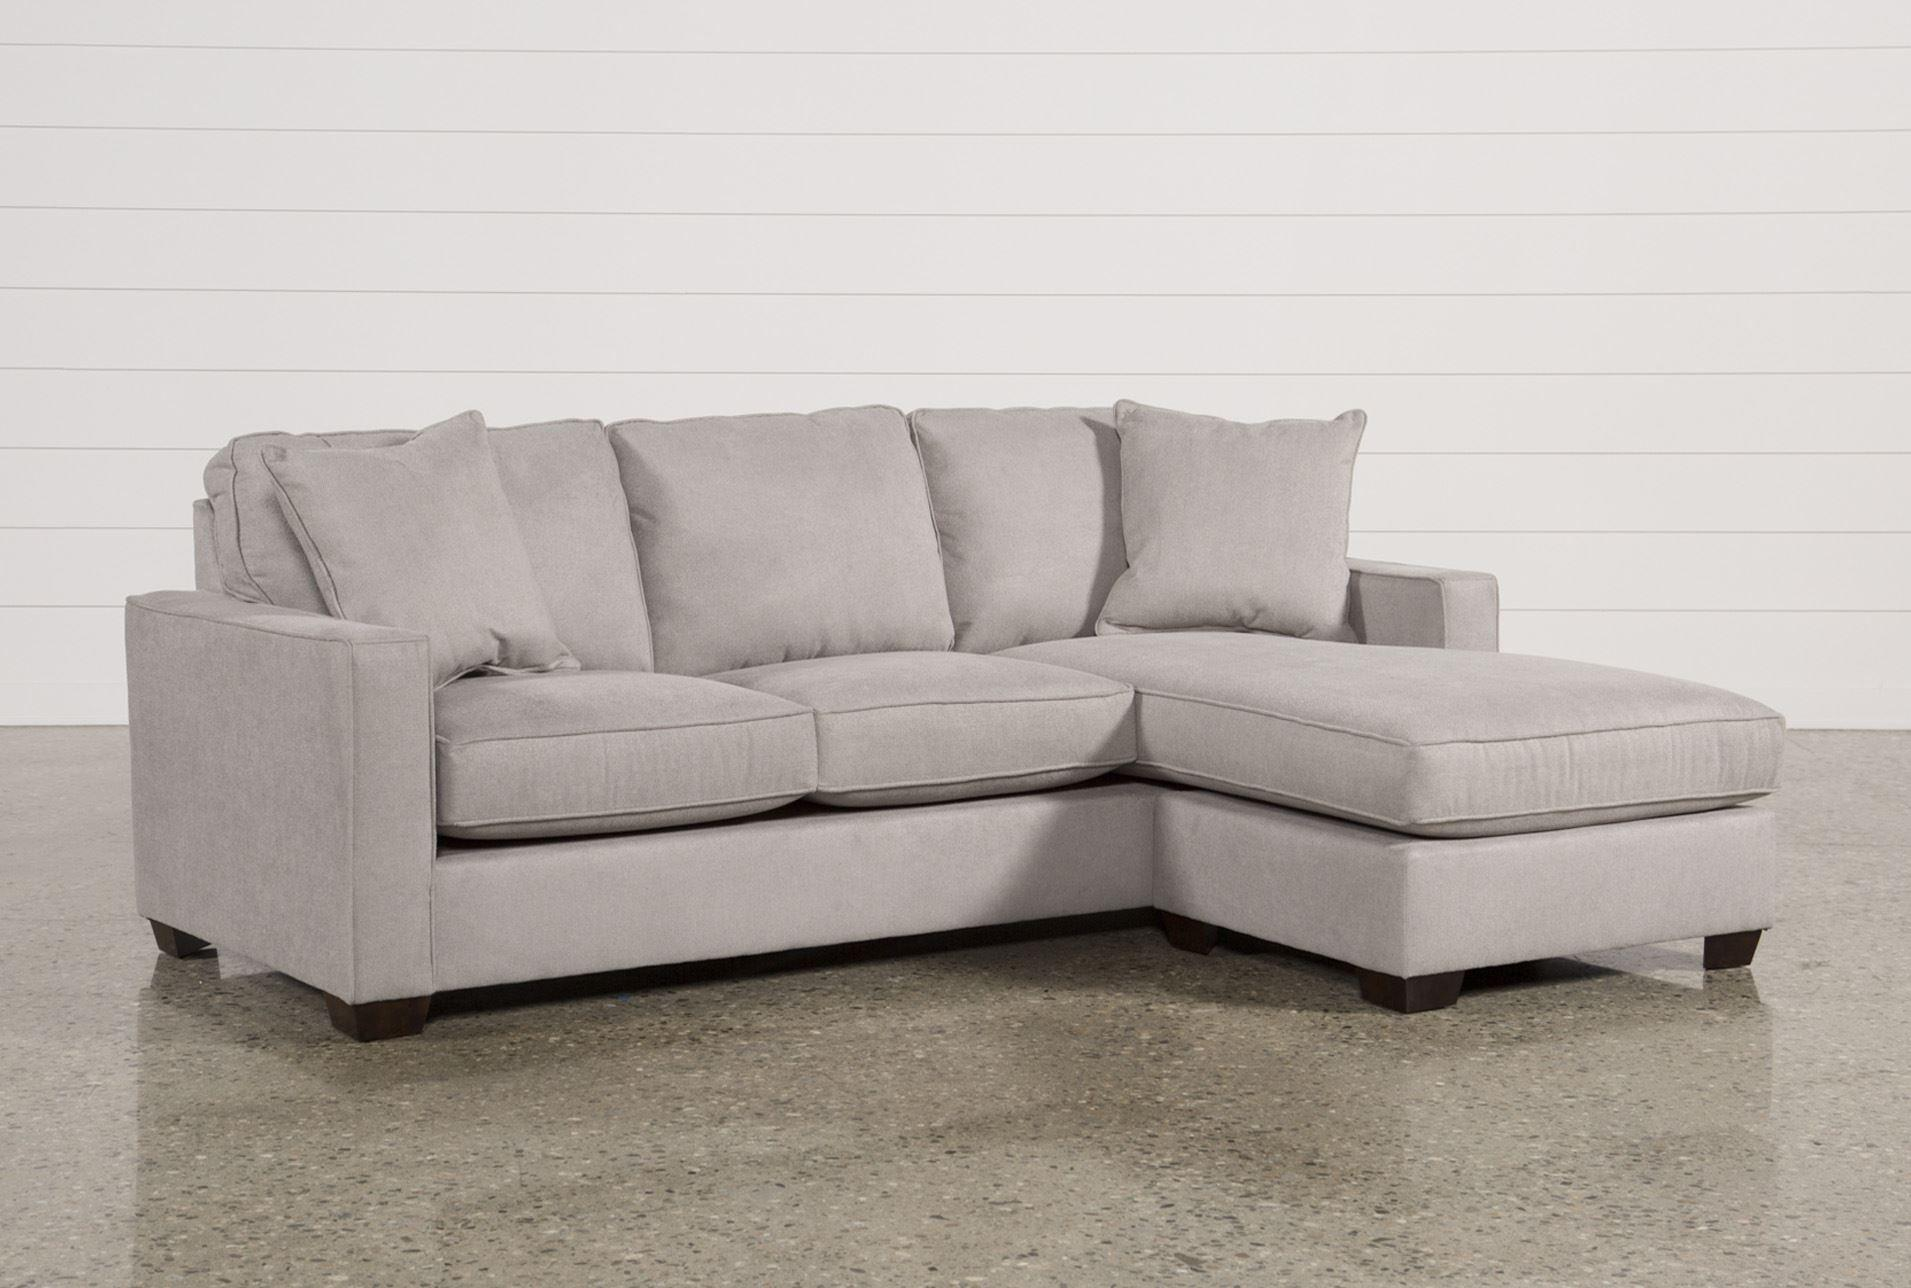 Clic Clac 2 Places Ikea Beau Galerie Eblouissant Canape Clic Clac but Ideas Furniture Corner Loveseat